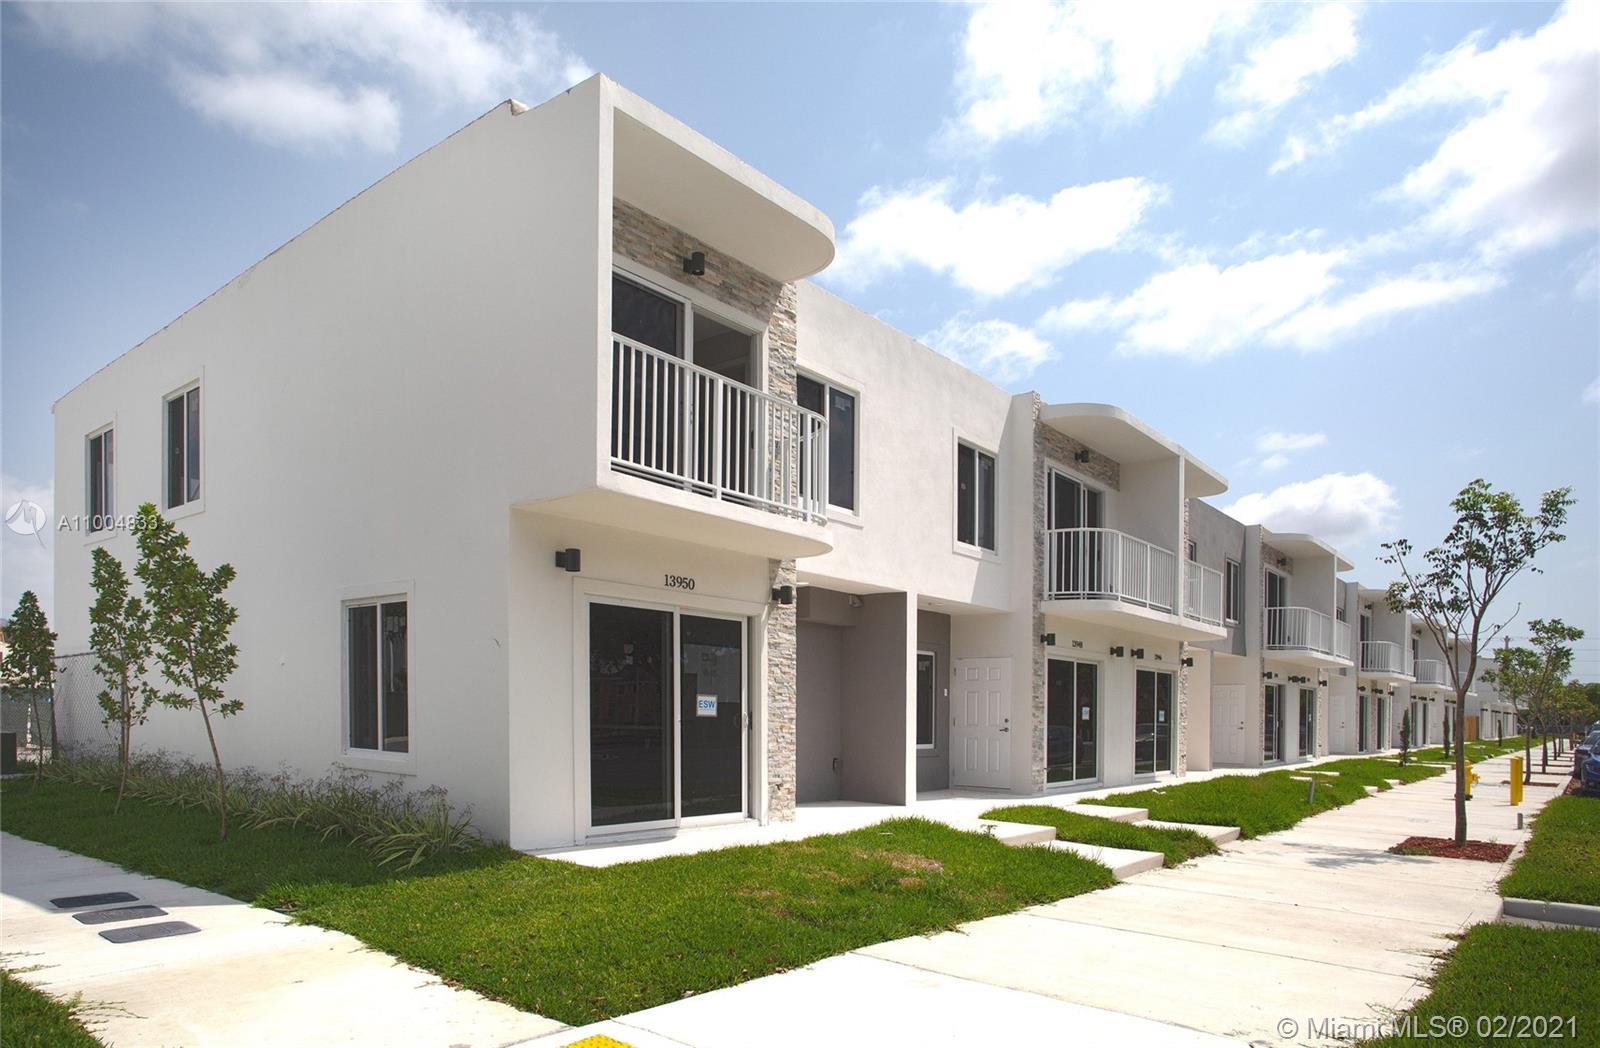 25867 Sw 139 Ct Property Photo 1